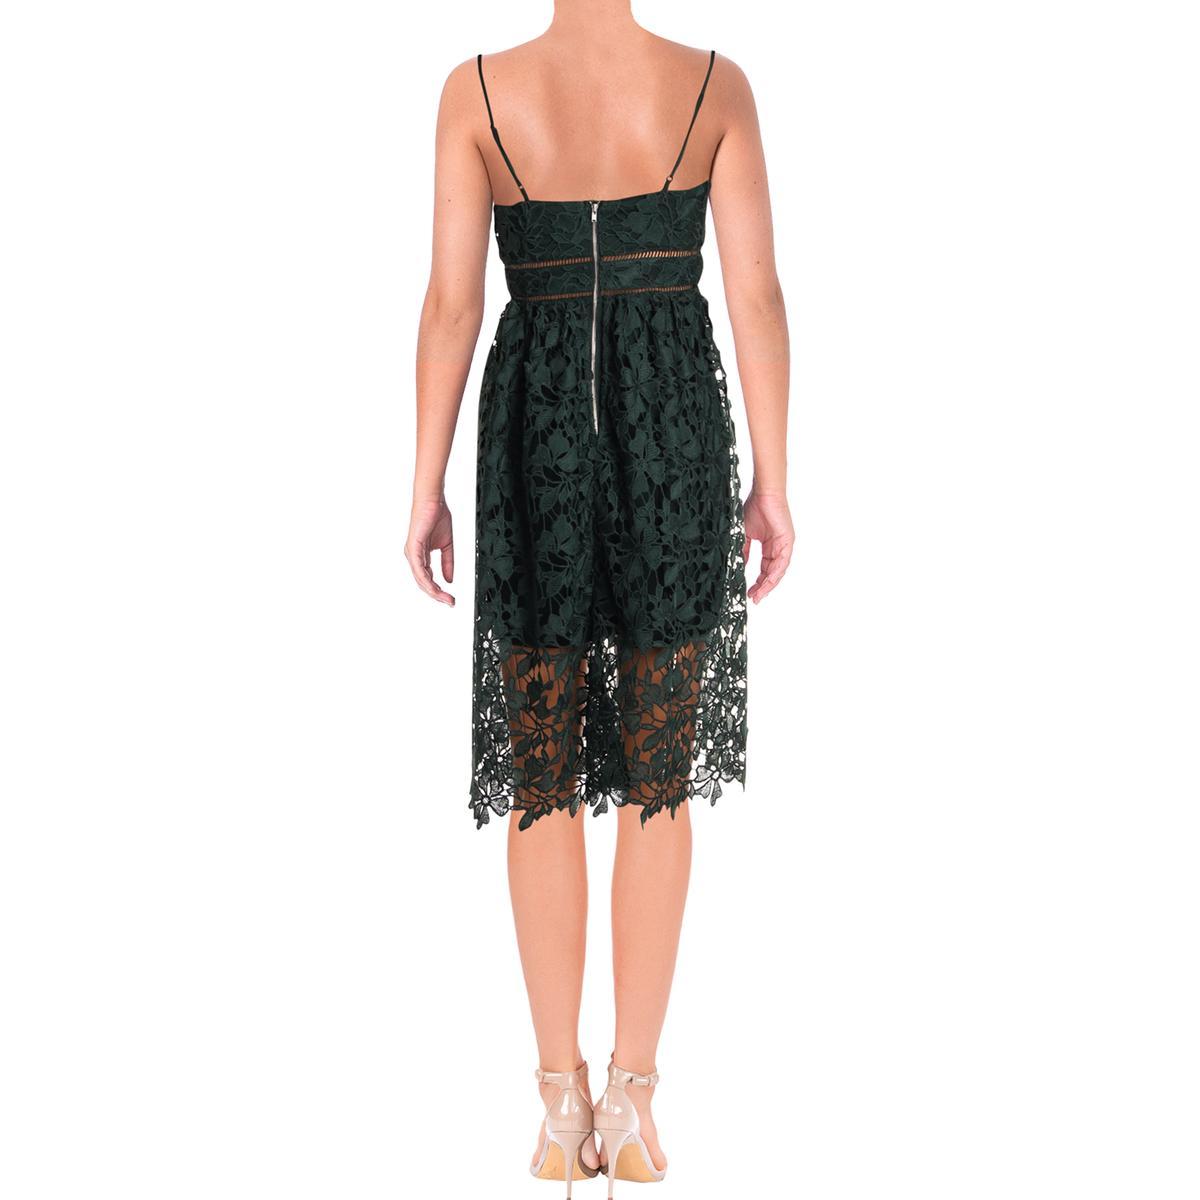 Bardot Womens Sonya Lace Overlay V-Neck Cocktail Party Dress BHFO 9829